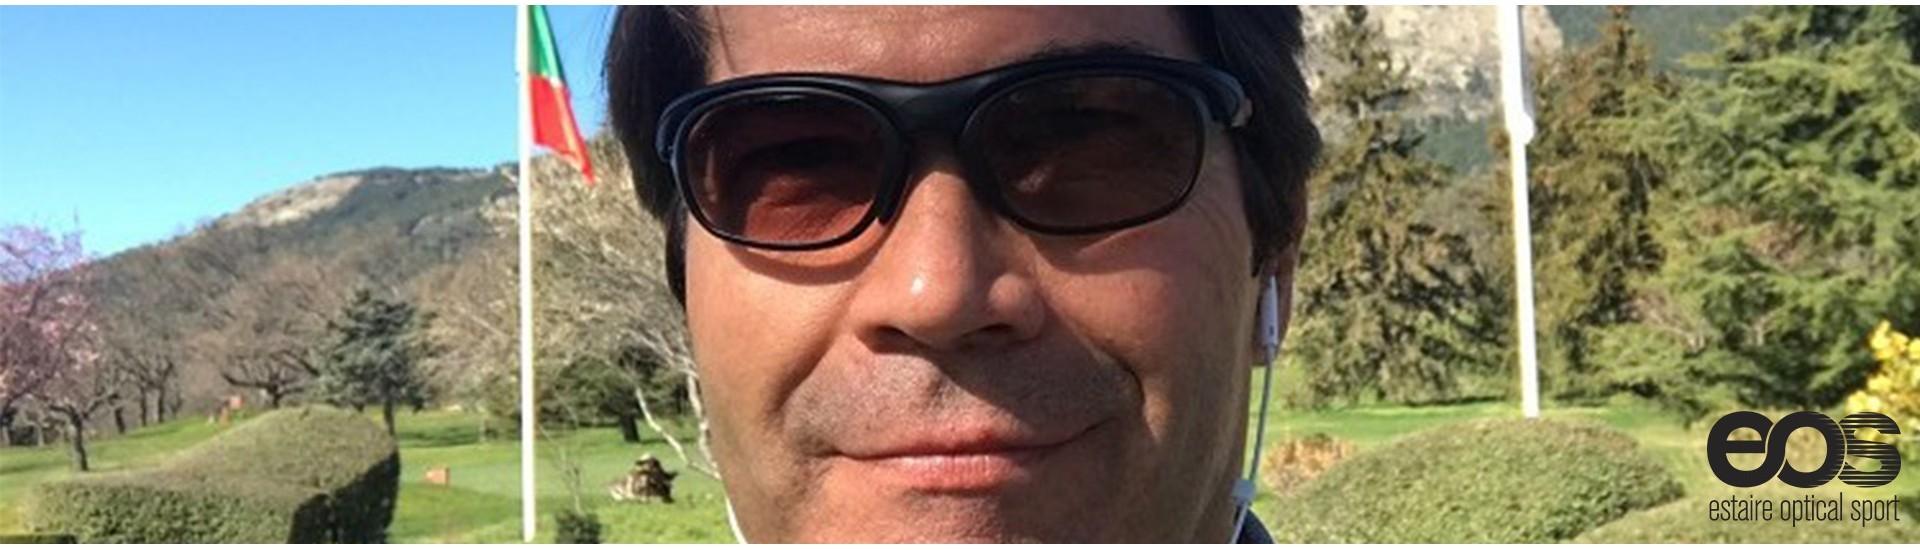 Alvaro Beamonte y sus gafas graduadas EOS